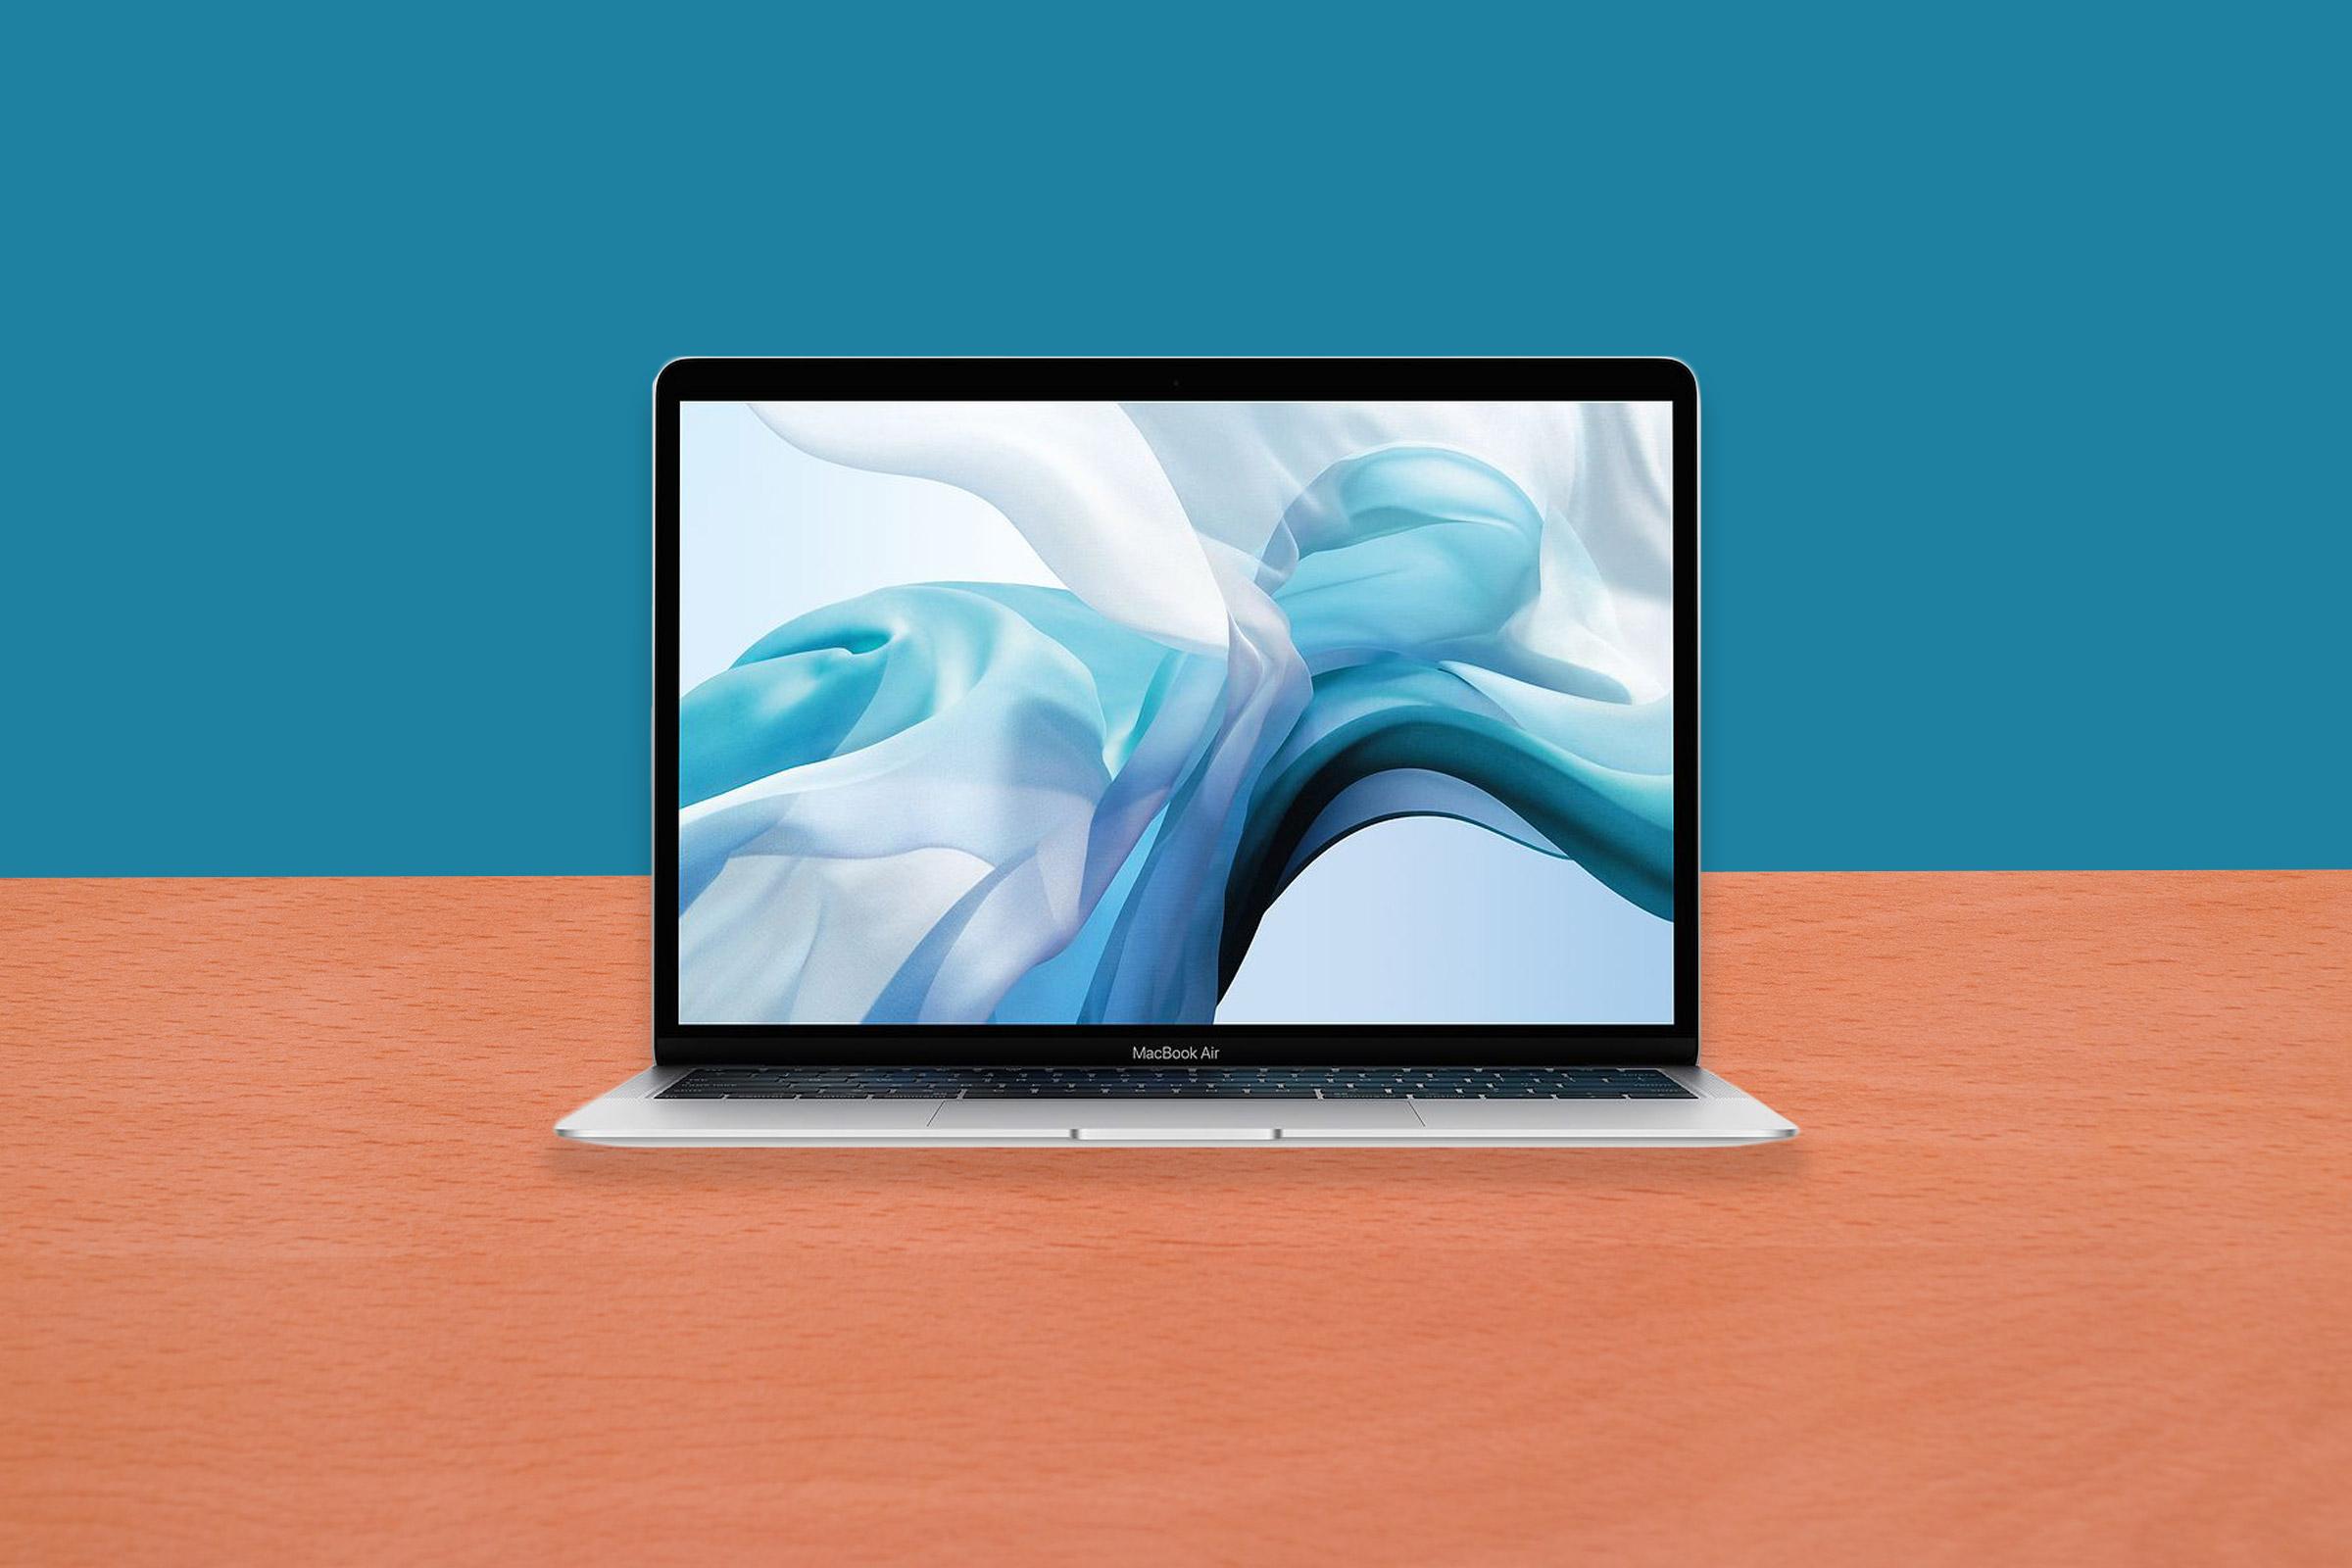 13.3-inch Apple MacBook Air